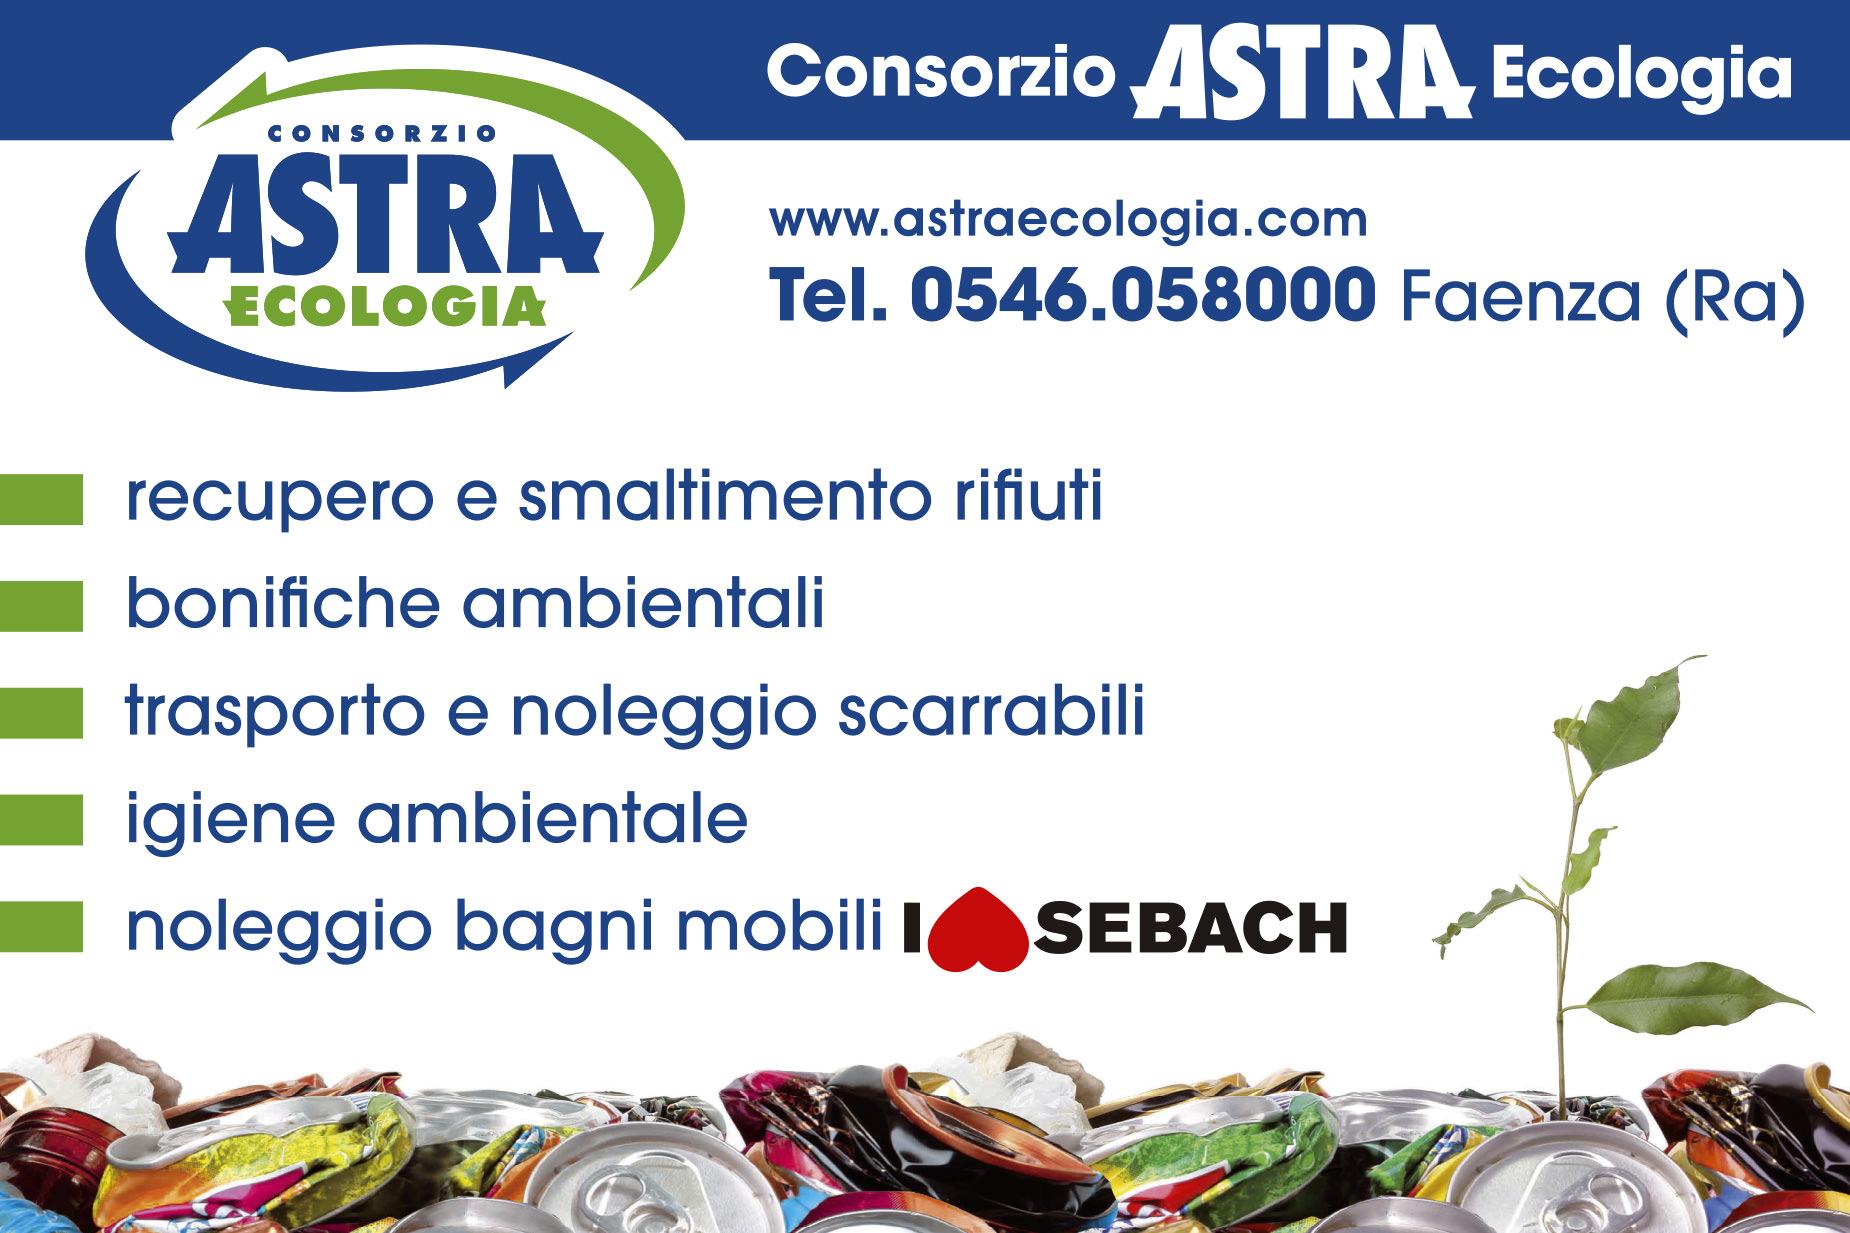 https://astraecologia.com/wp-content/uploads/2021/09/home-banner-AstraEcologia-servizi-21.jpg